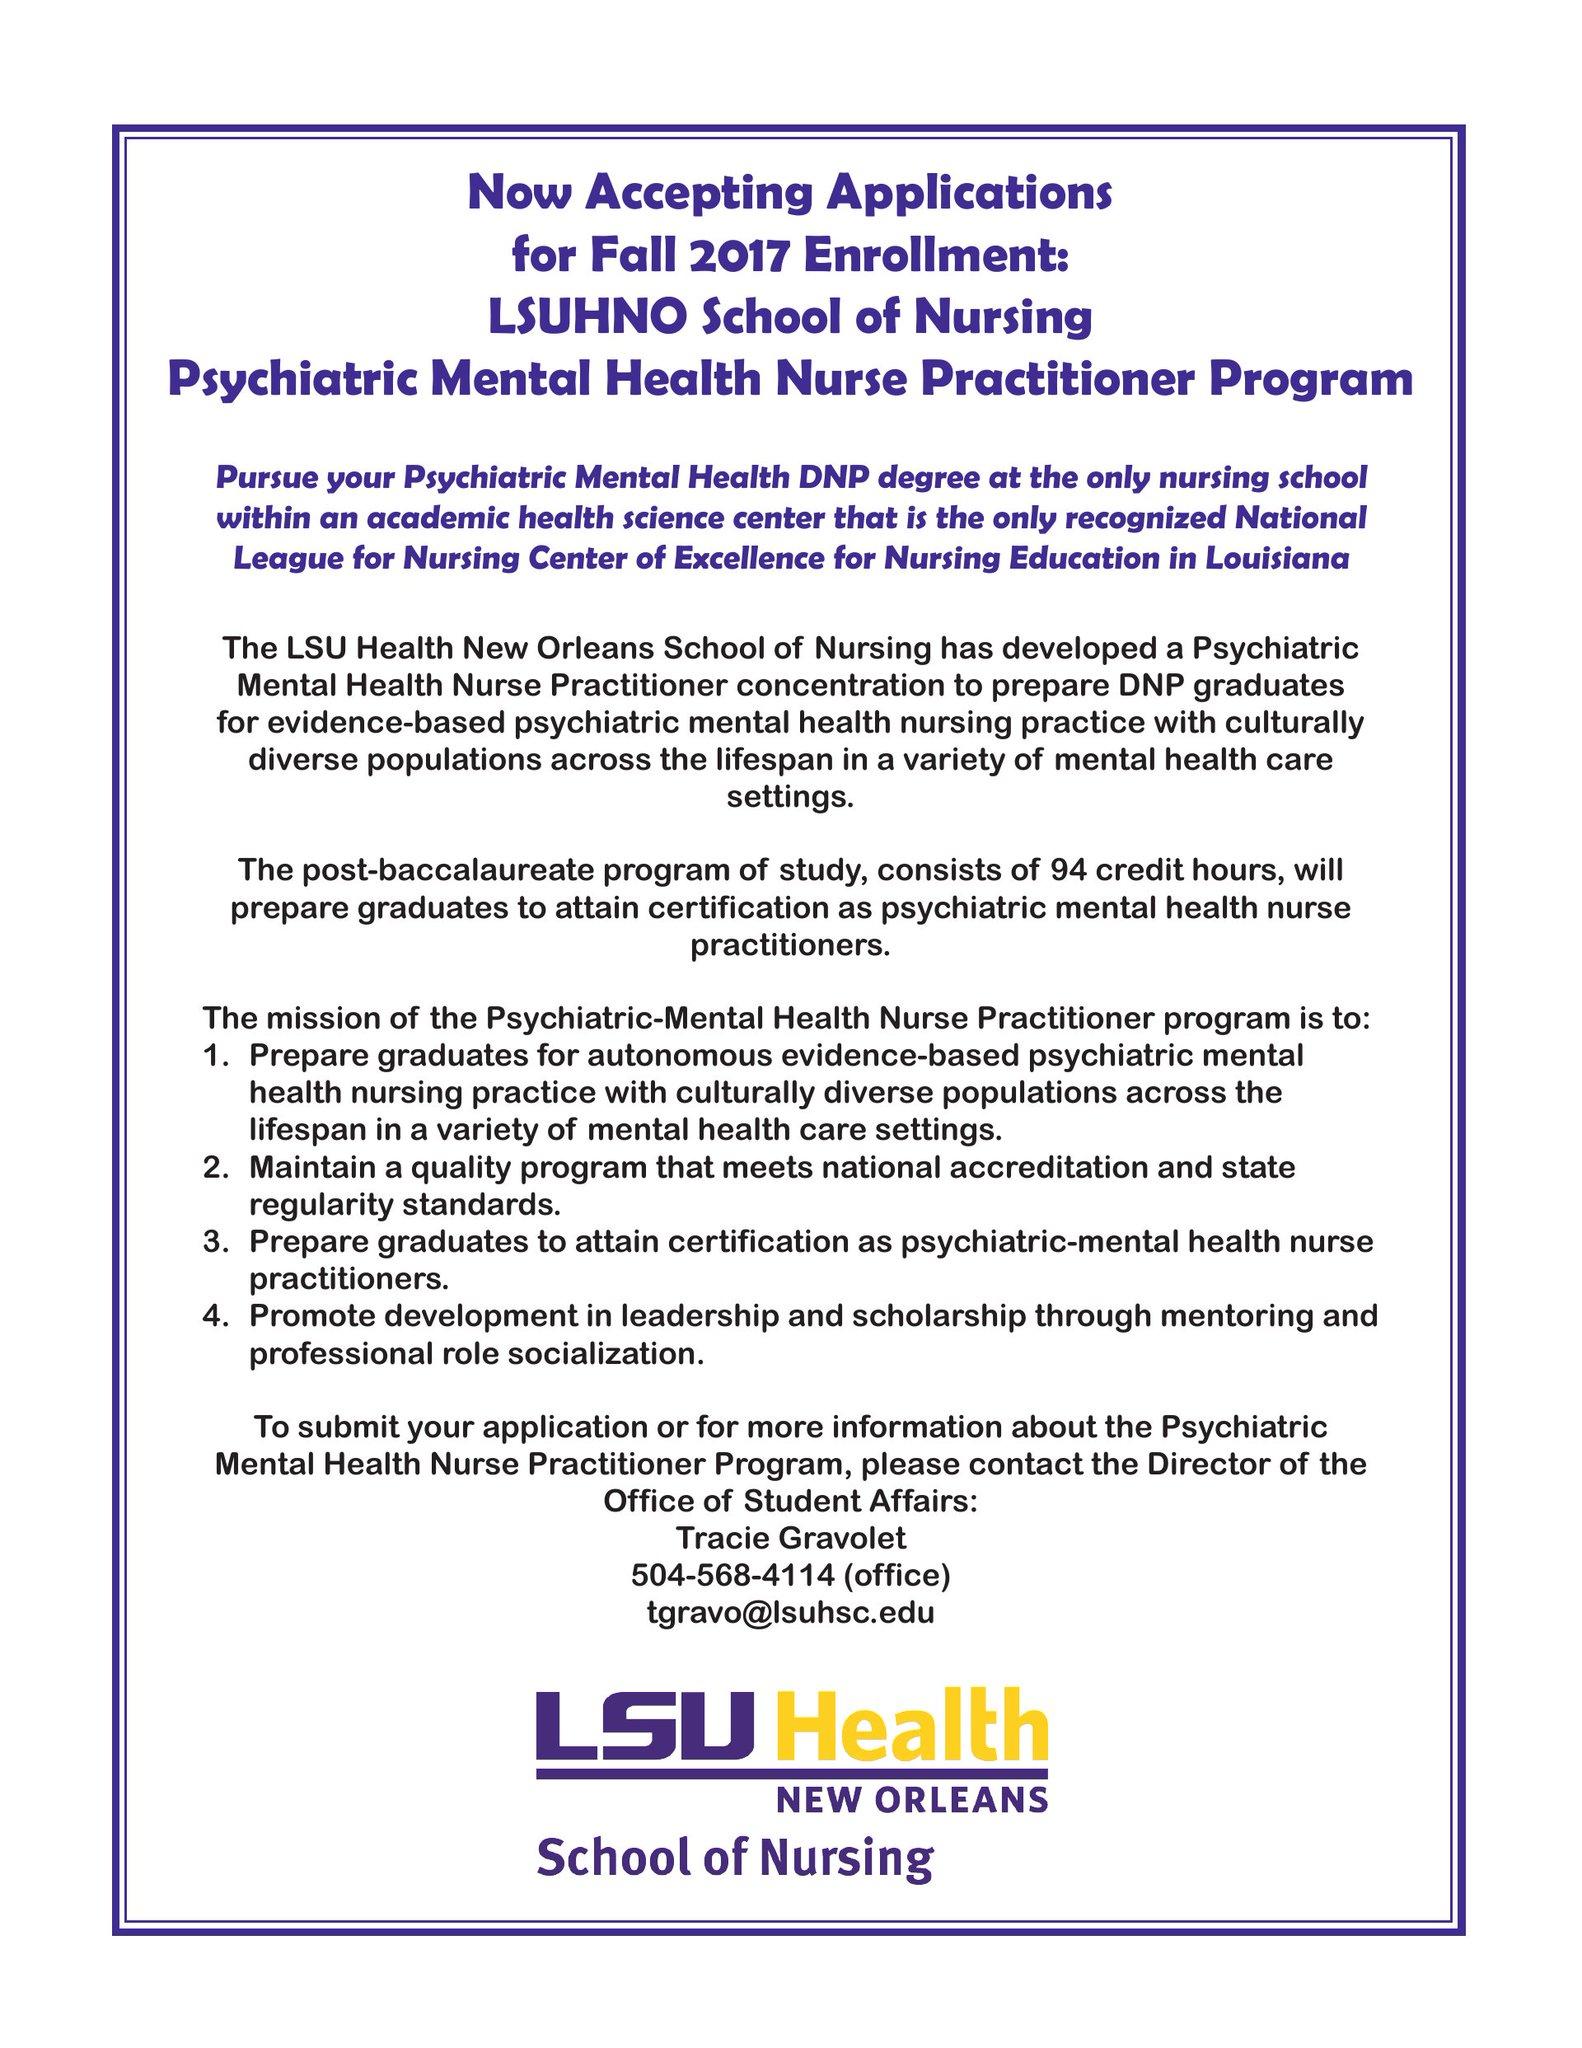 Lsu No Nursing On Twitter Our Psychiatric Mental Health Nurse